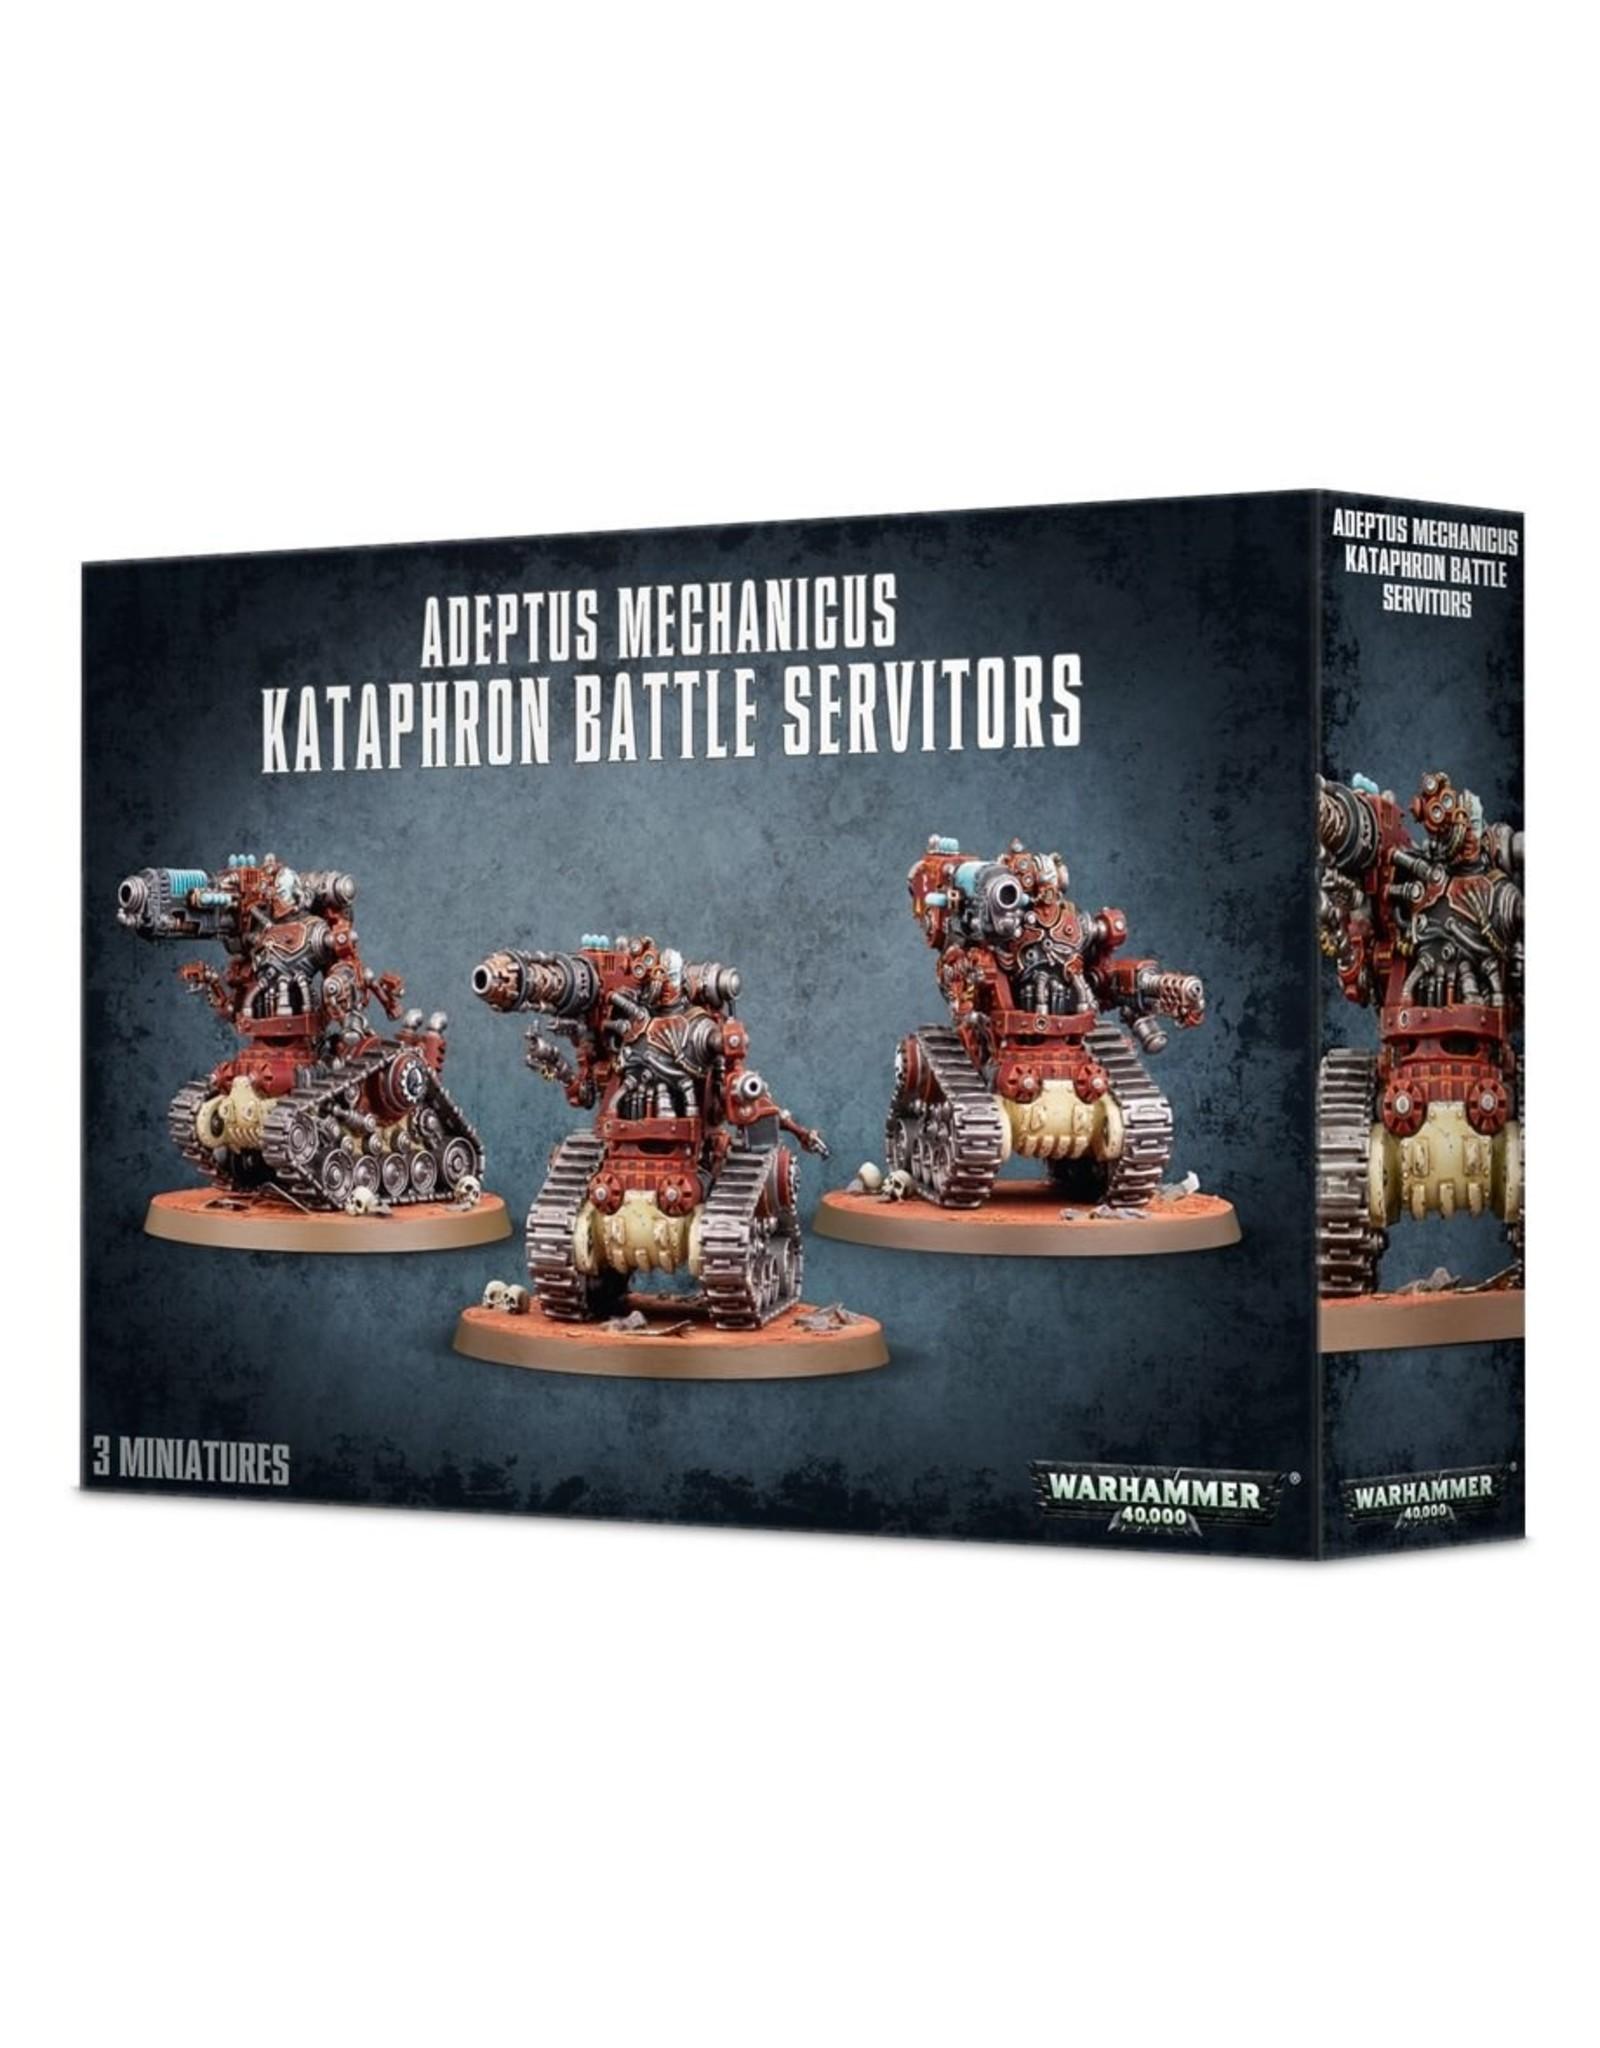 Warhammer 40K: Adeptus Mechanicus Kataphron Battle Servitors - Destroyers